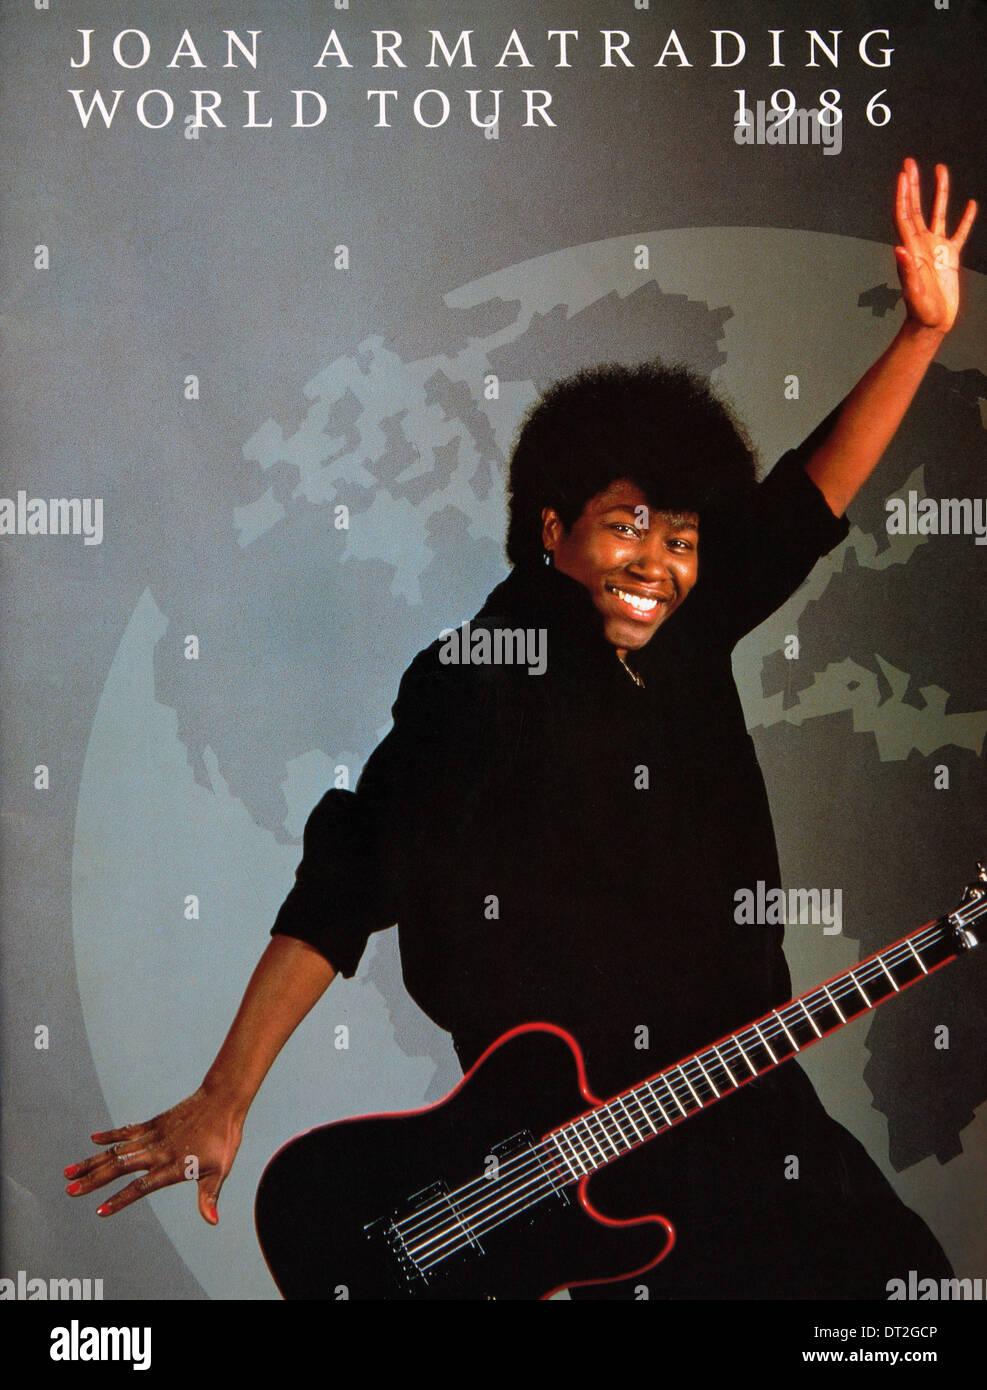 Joan Armatrading World Tour 1986 Brochure Photo Stock